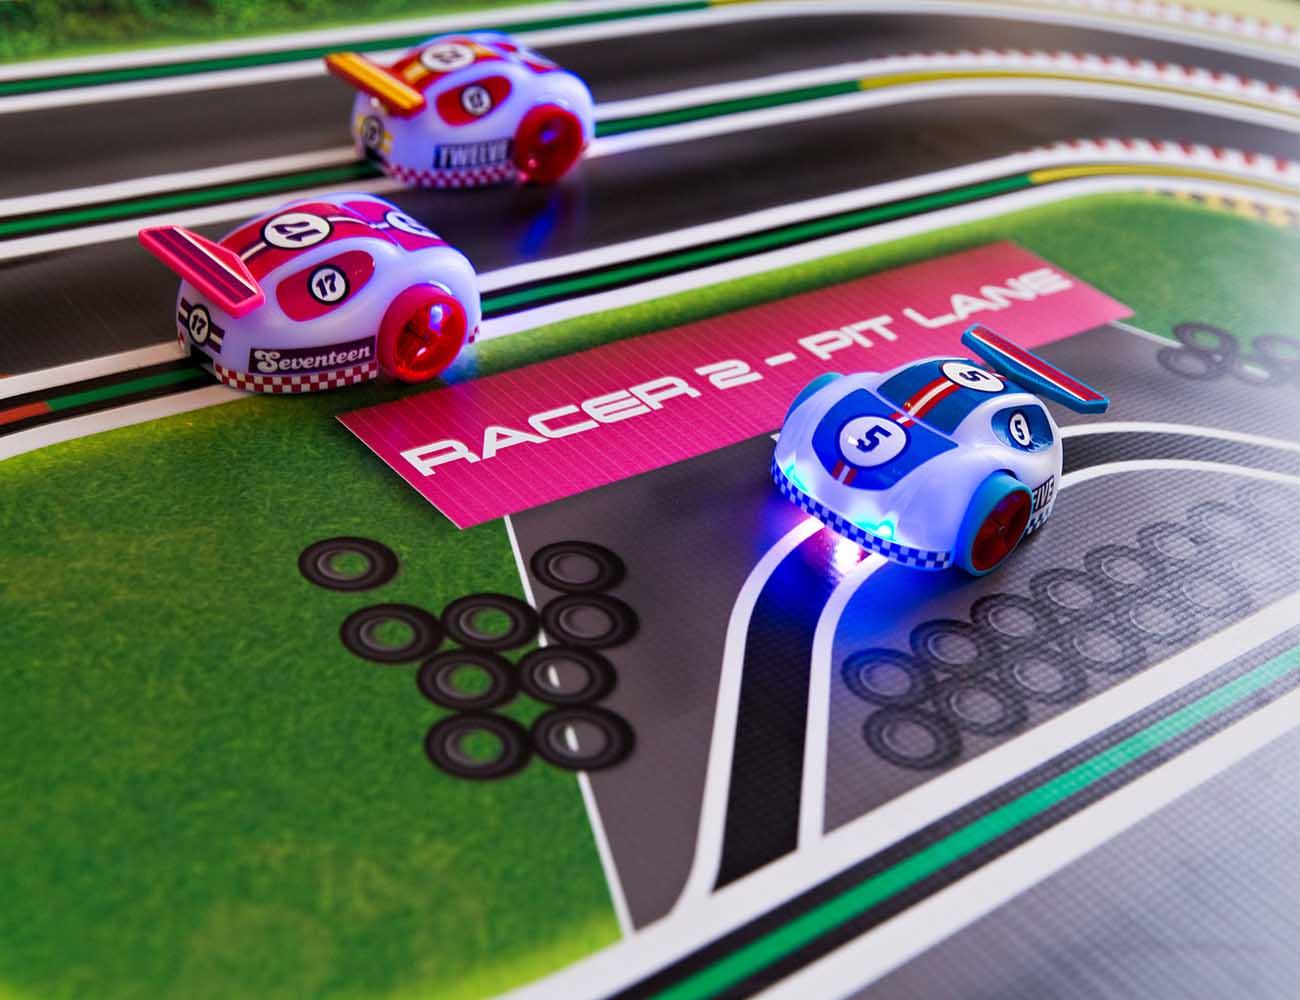 Toys 2.0 – Smart Toy Robots